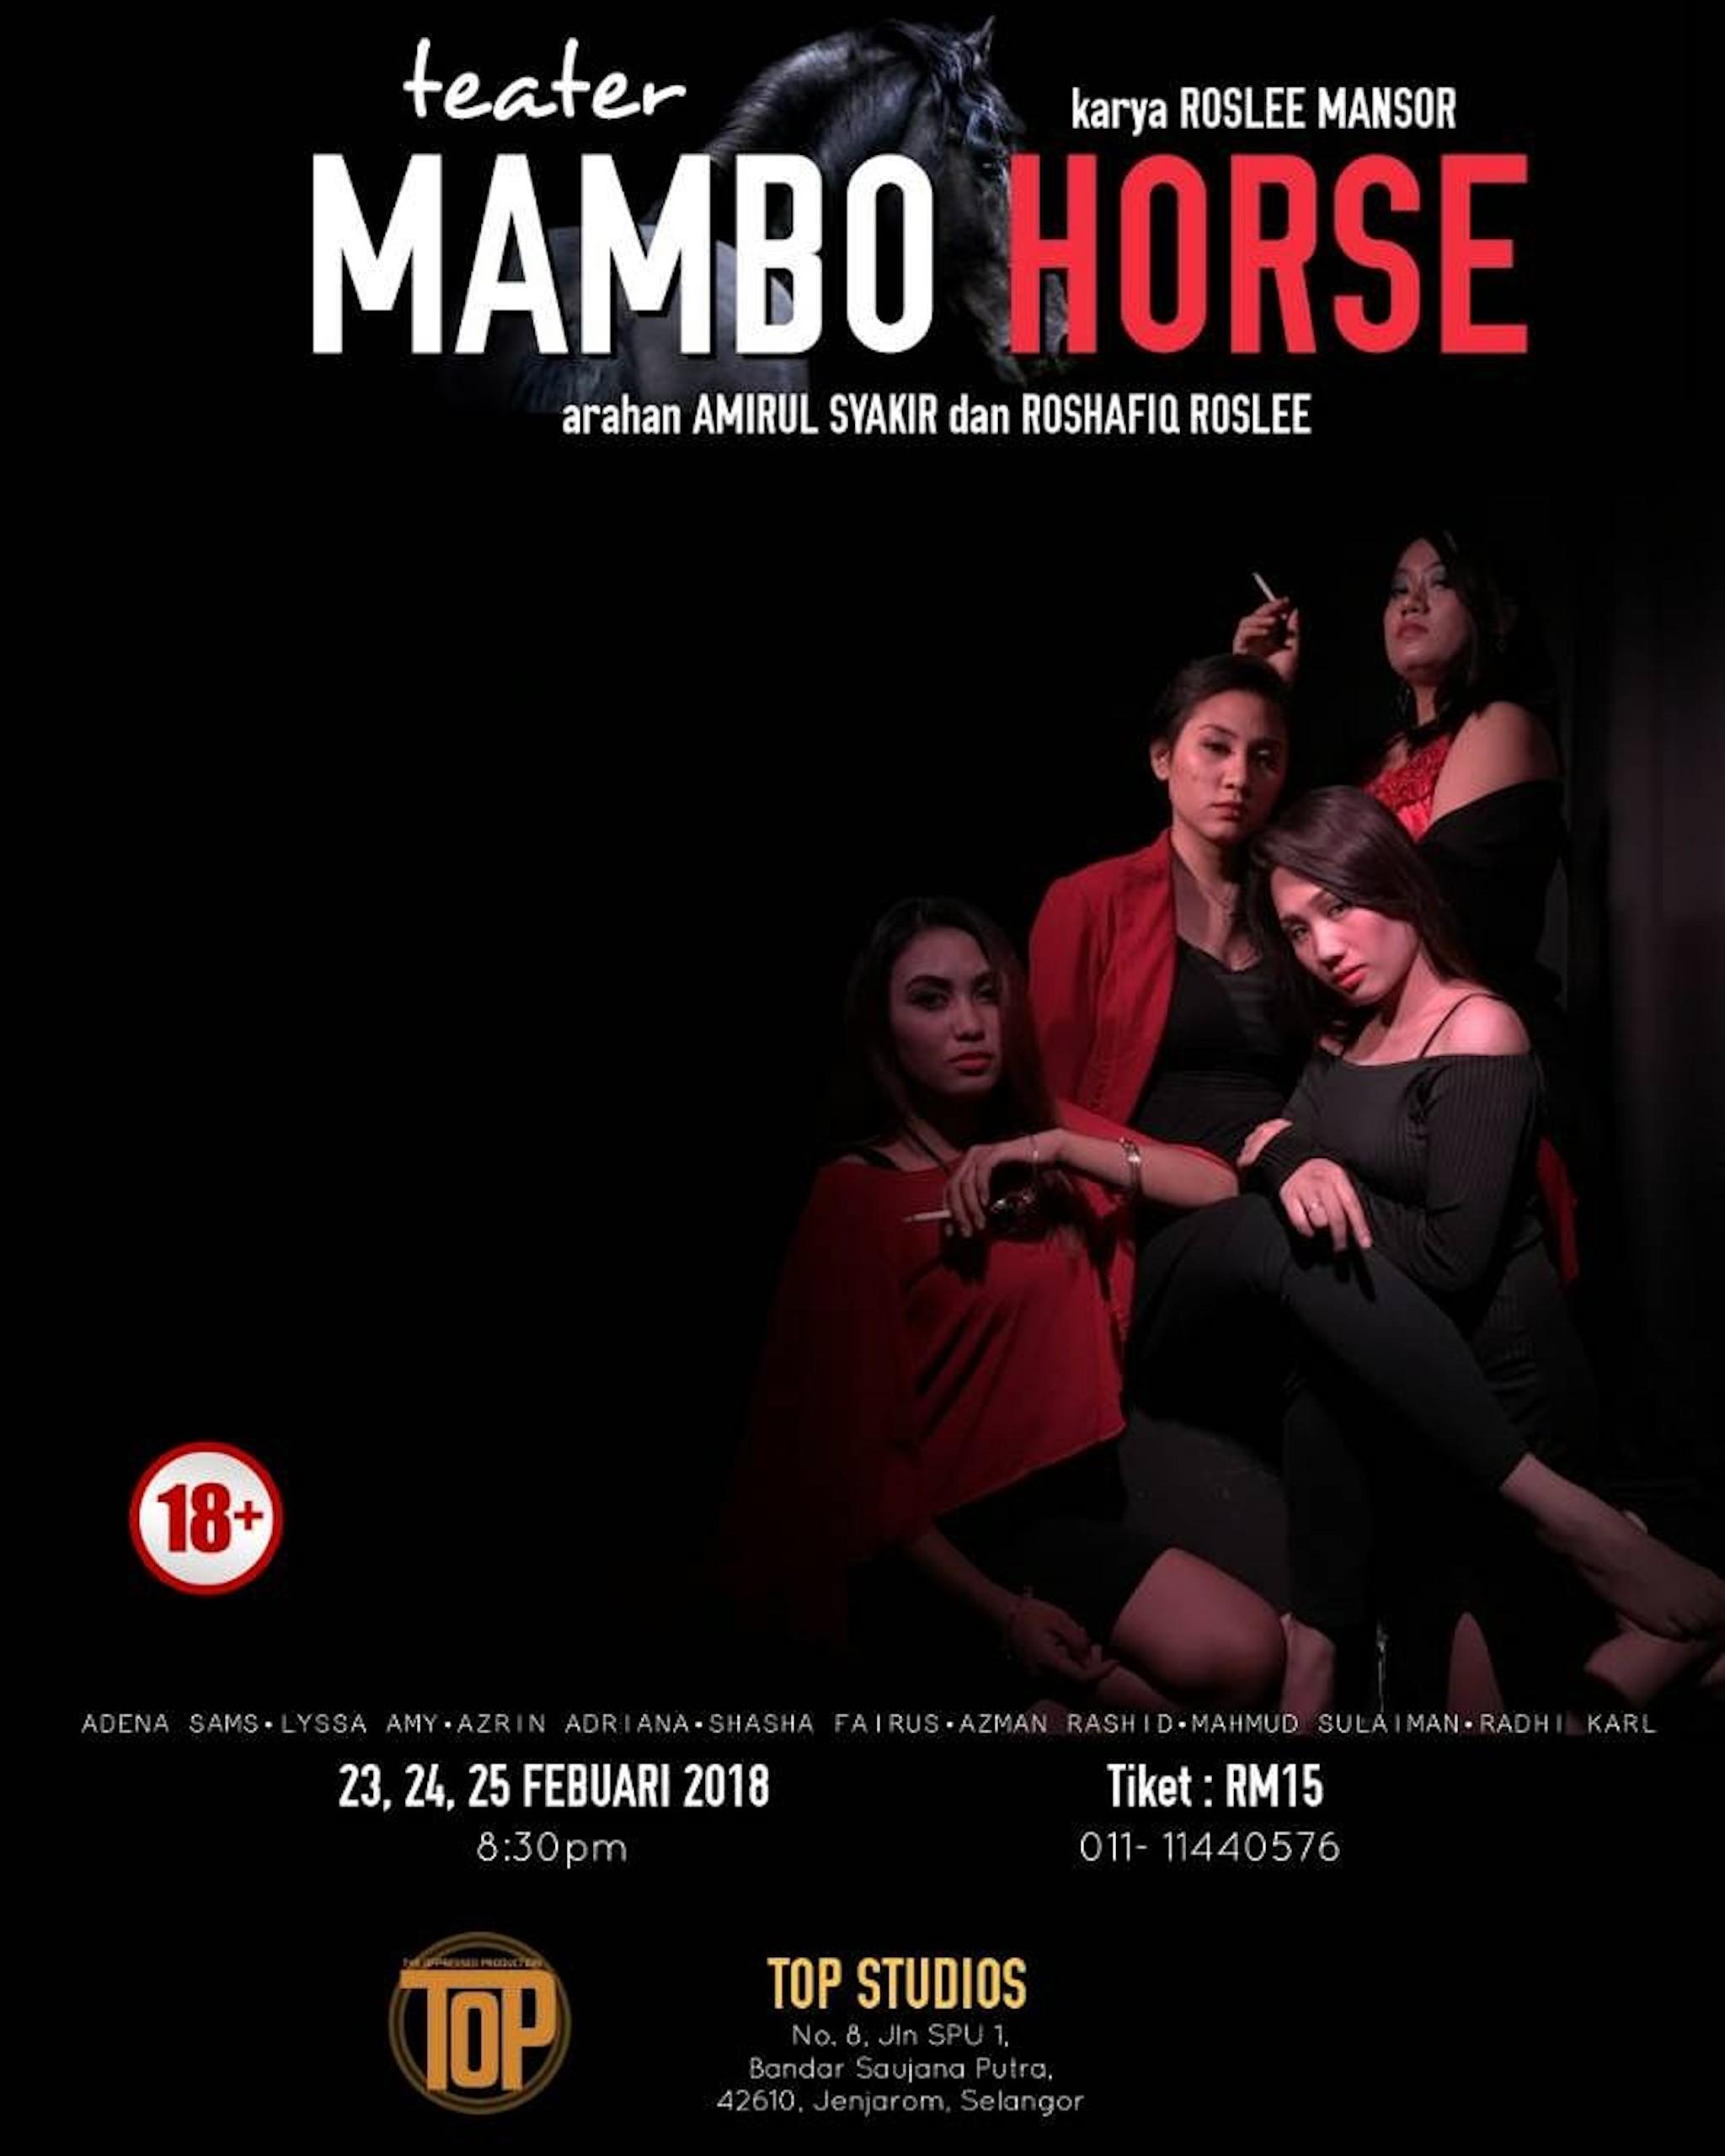 2018 Mambo Horse cover